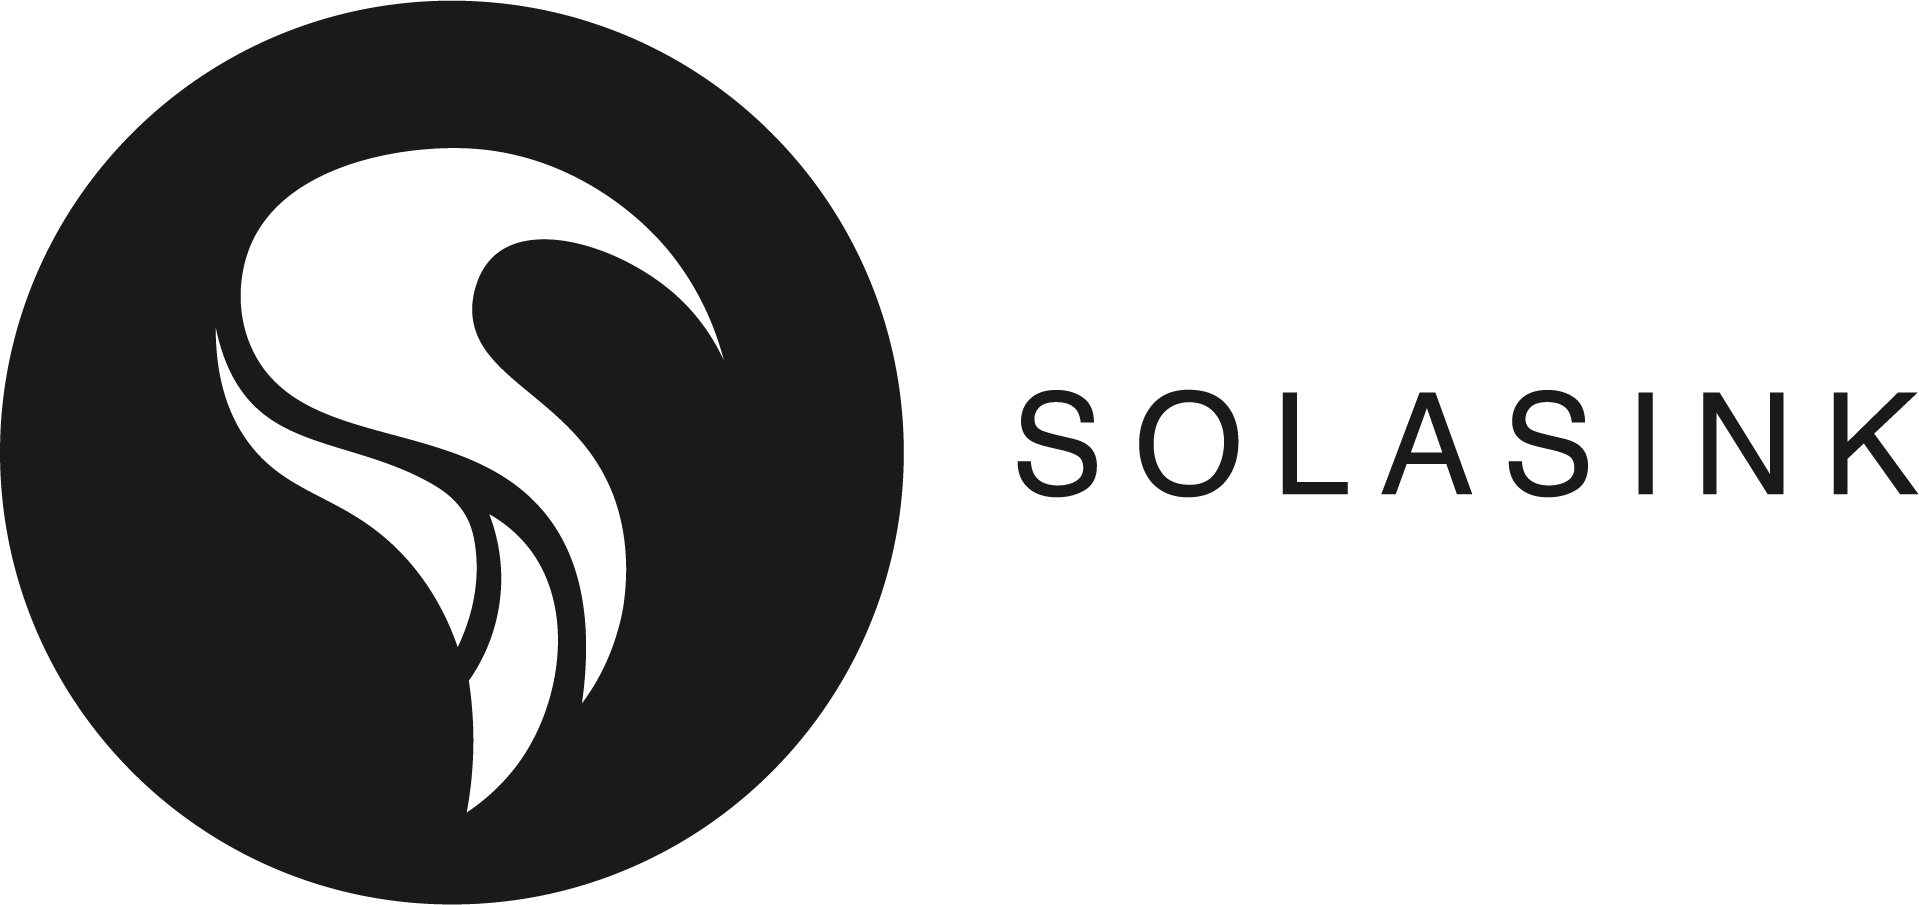 SOLASINK